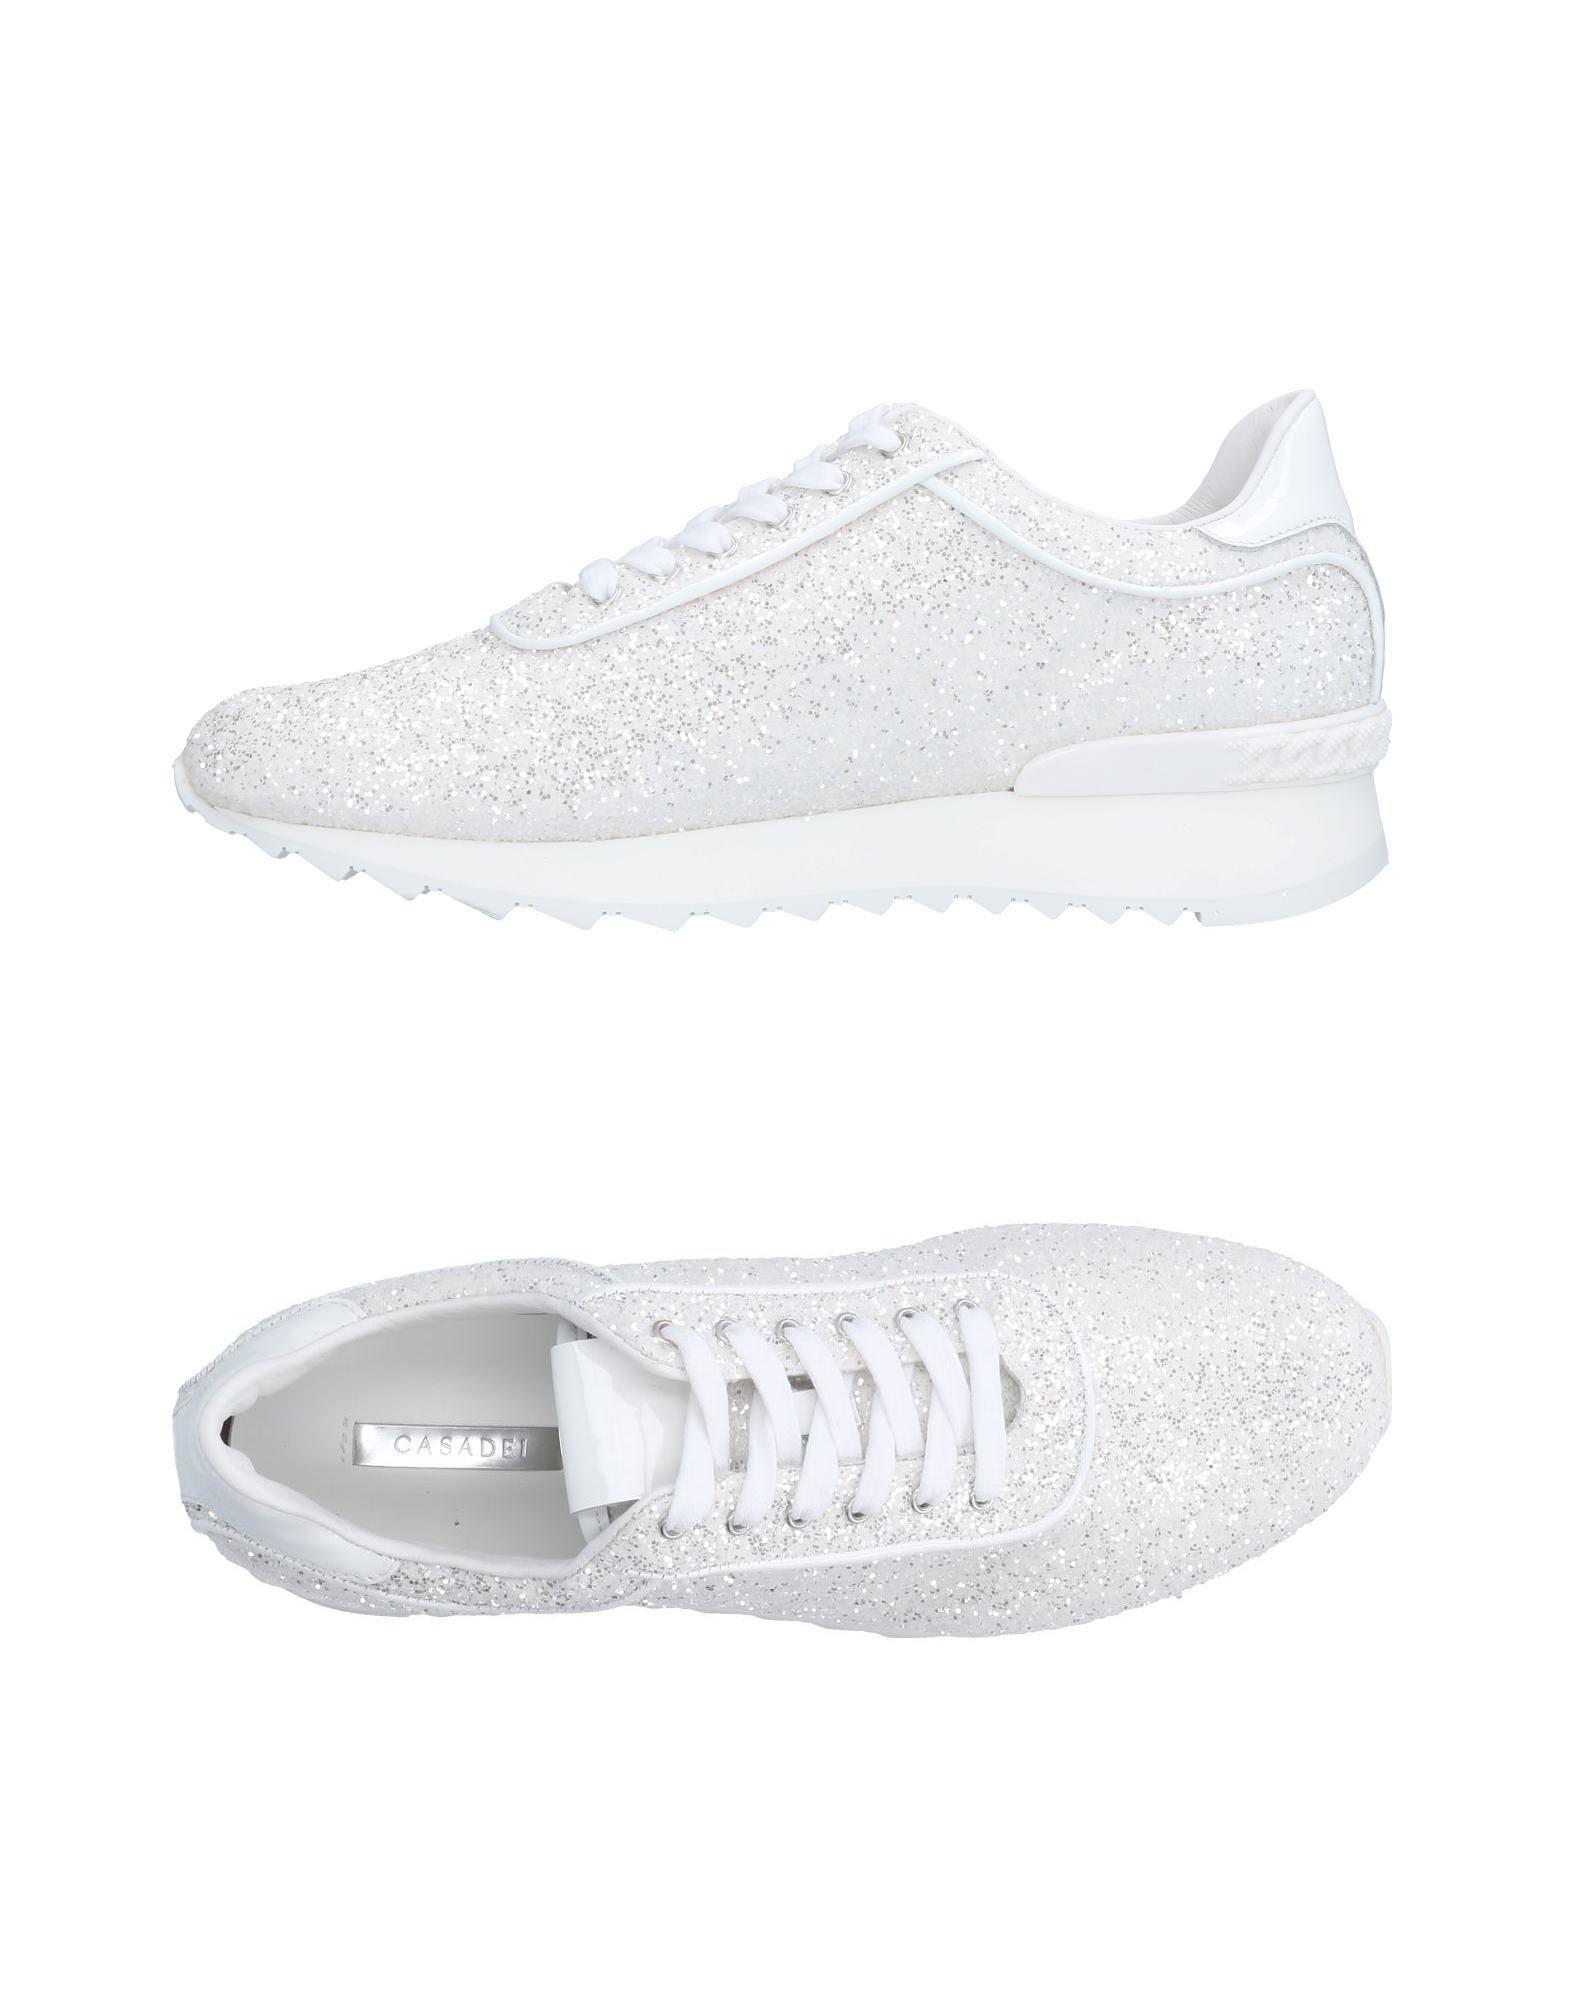 Zapatillas Casadei Mujer - Zapatillas Zapatillas - Casadei  Blanco 47e4a4